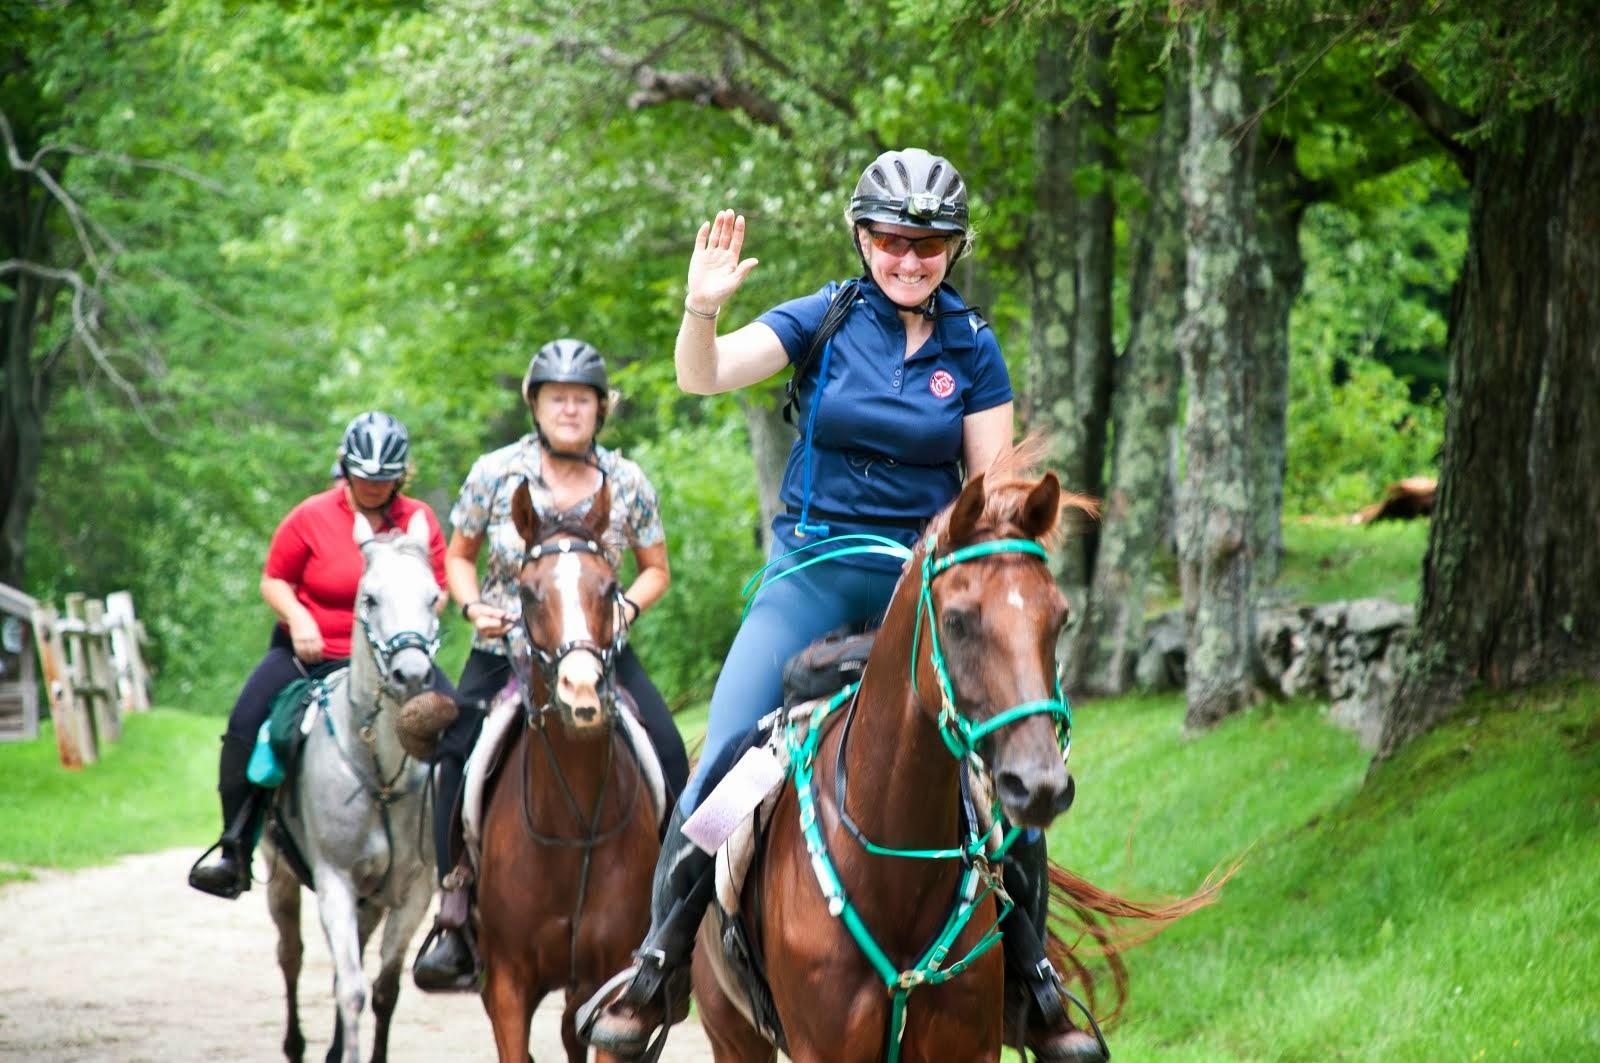 Vermont 100 Endurance Ride